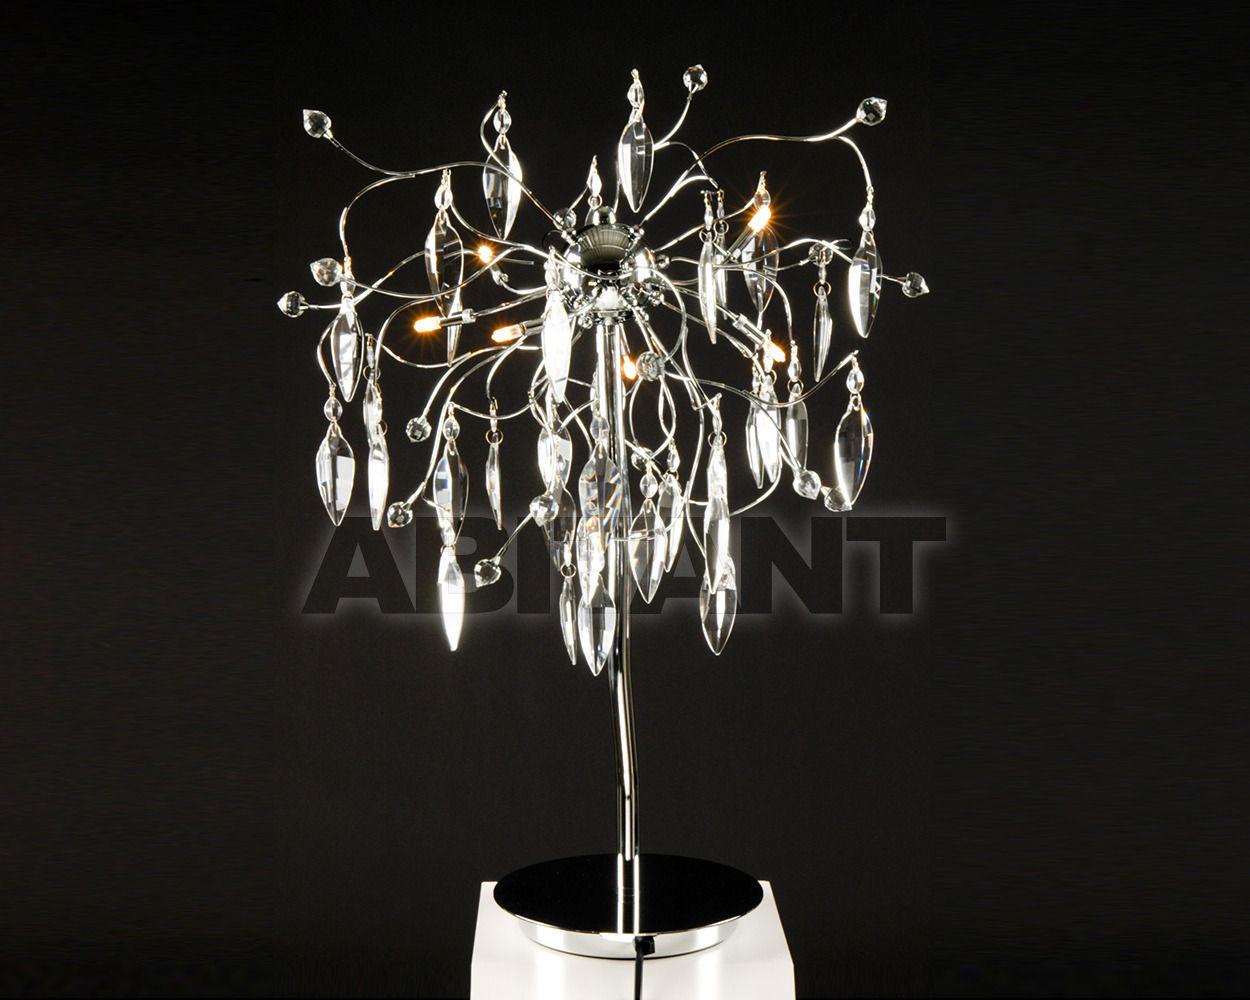 Купить Лампа настольная Linea Verdace 2012 LV 72044/H